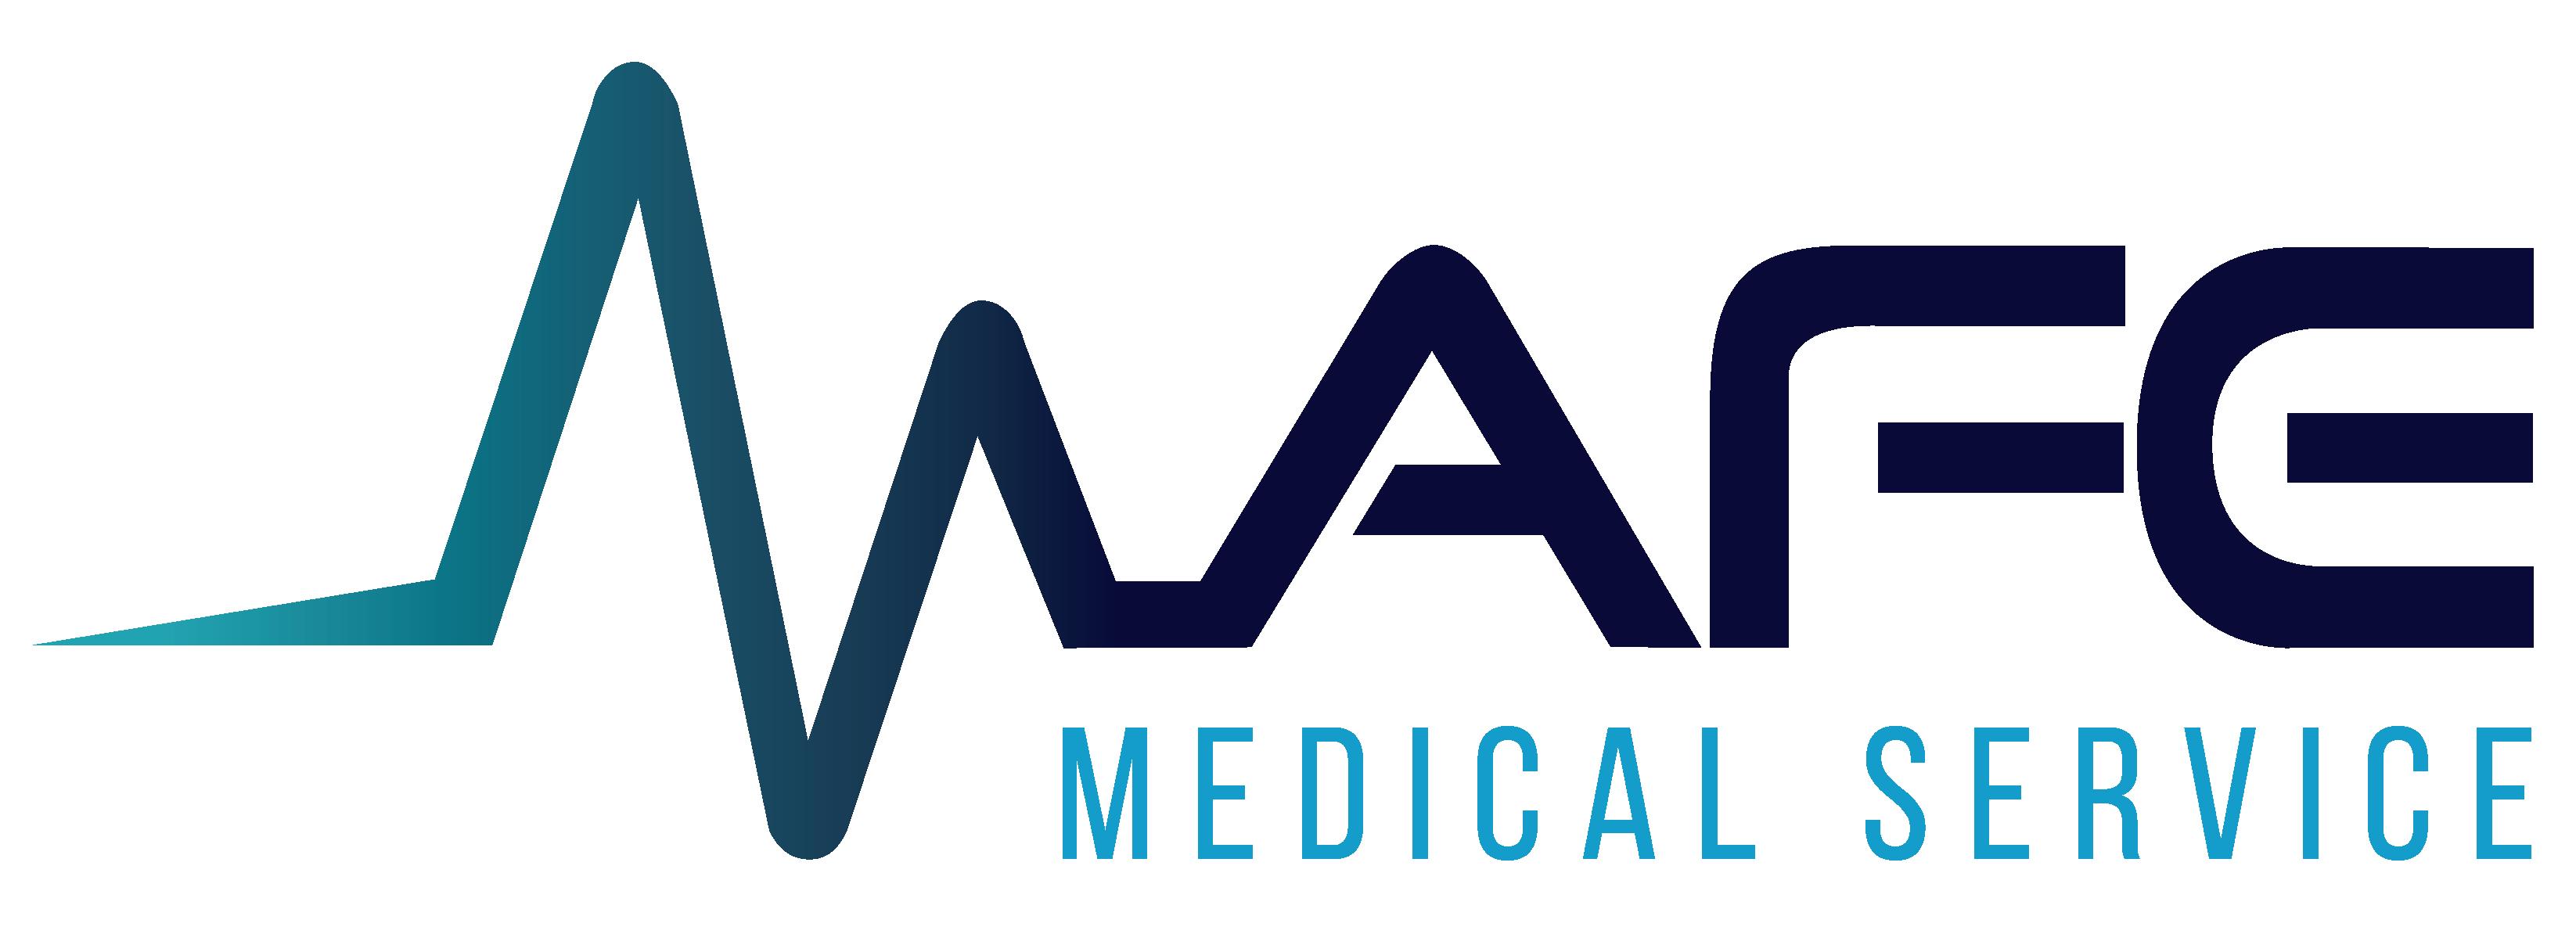 Mafe Medical Service